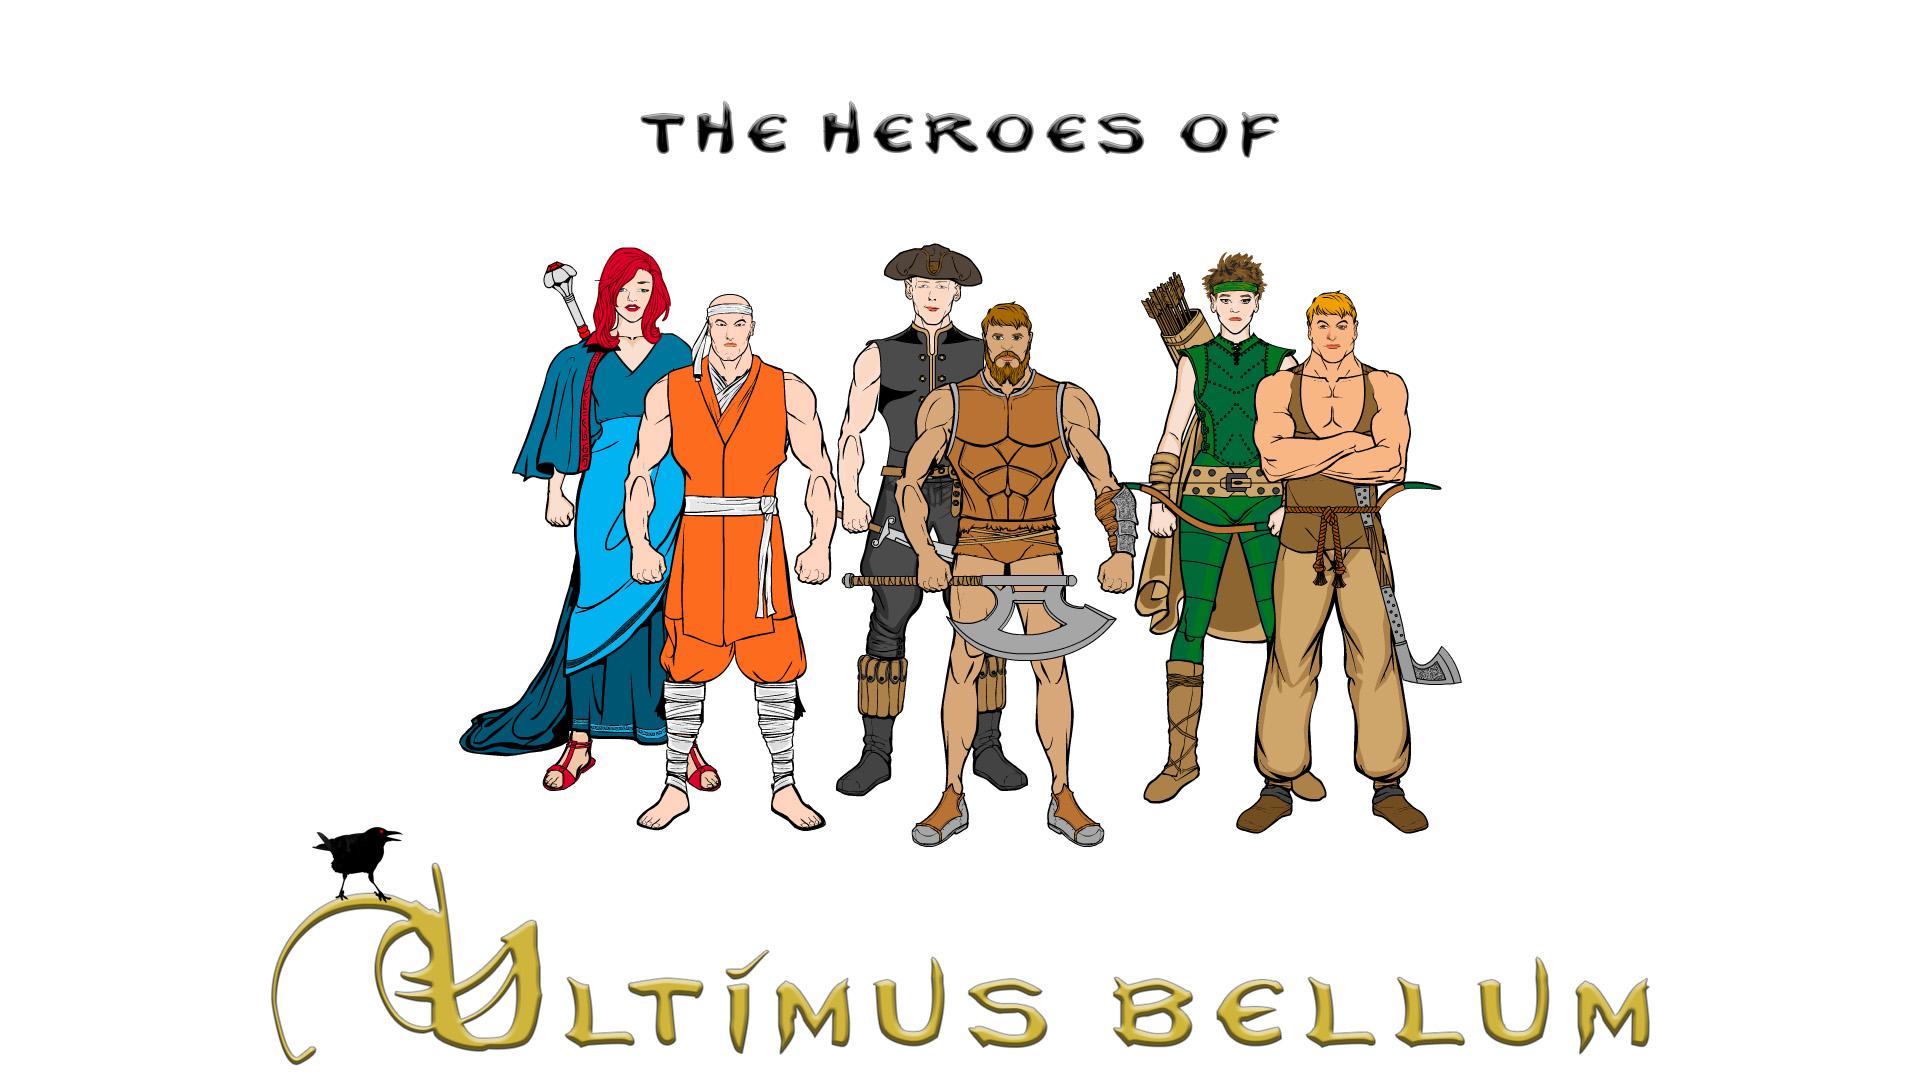 Heroes of Ultimus bellum